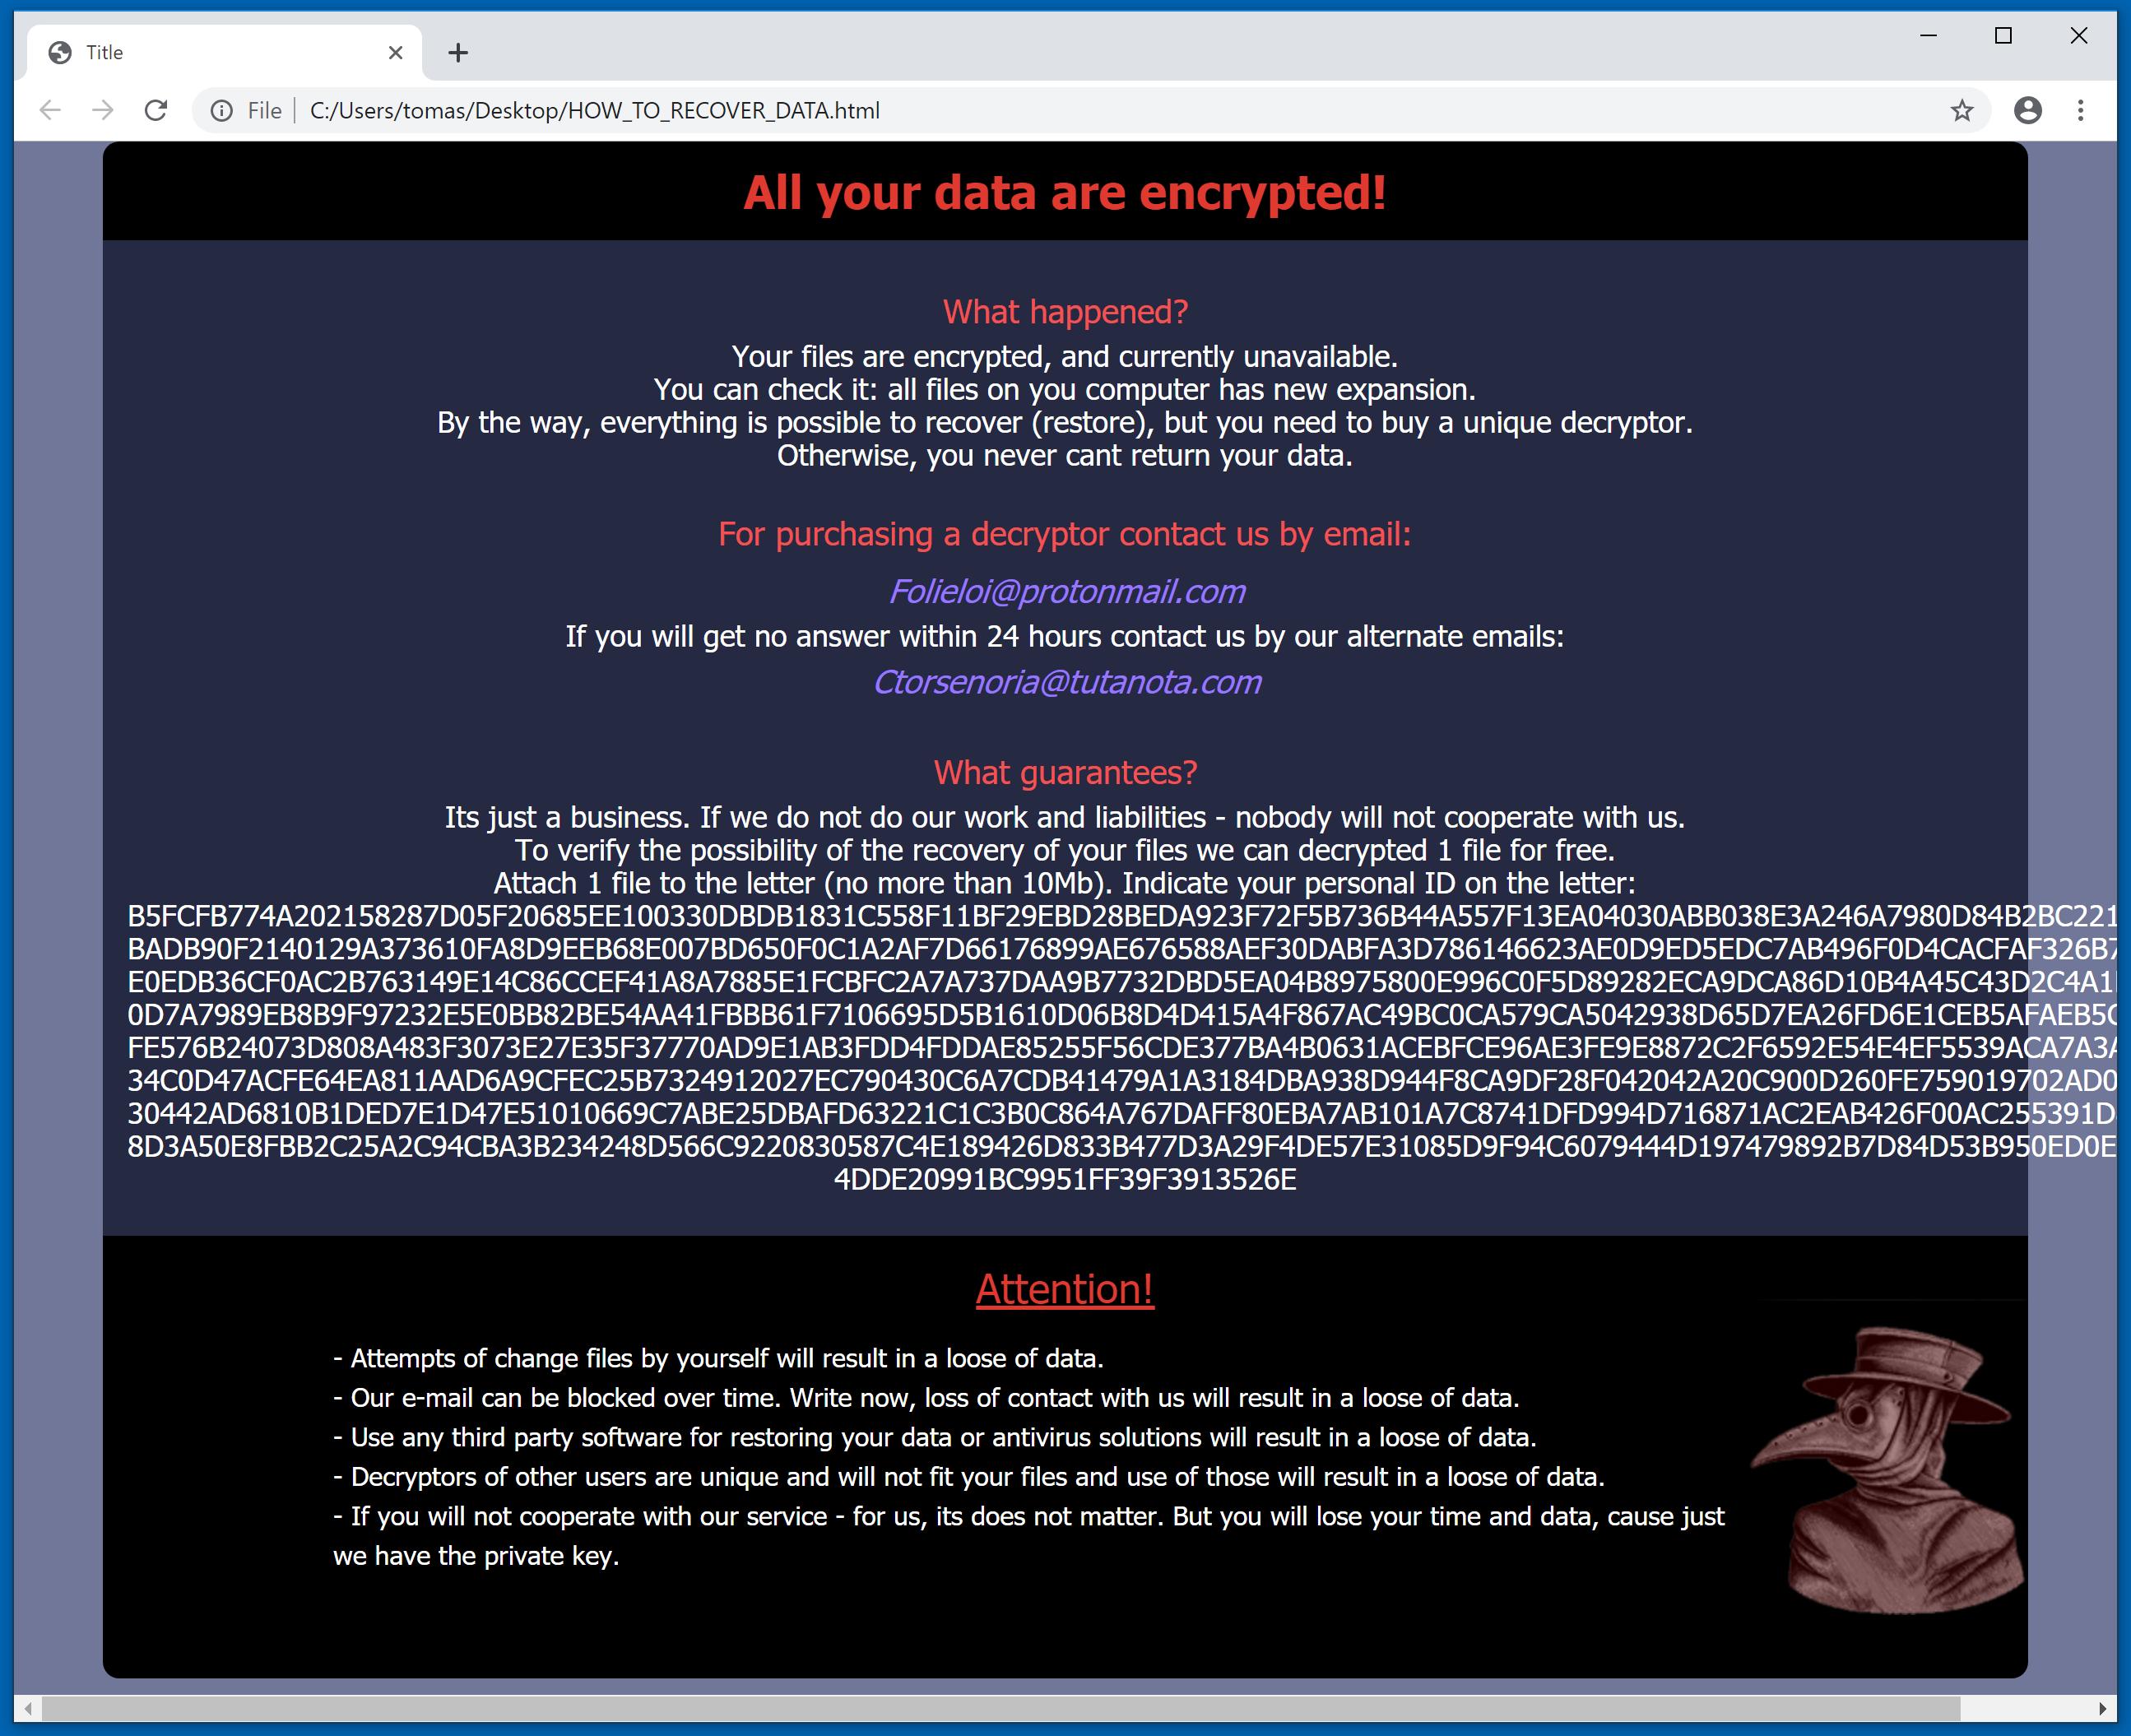 medusa ransomware - ransom demanding message